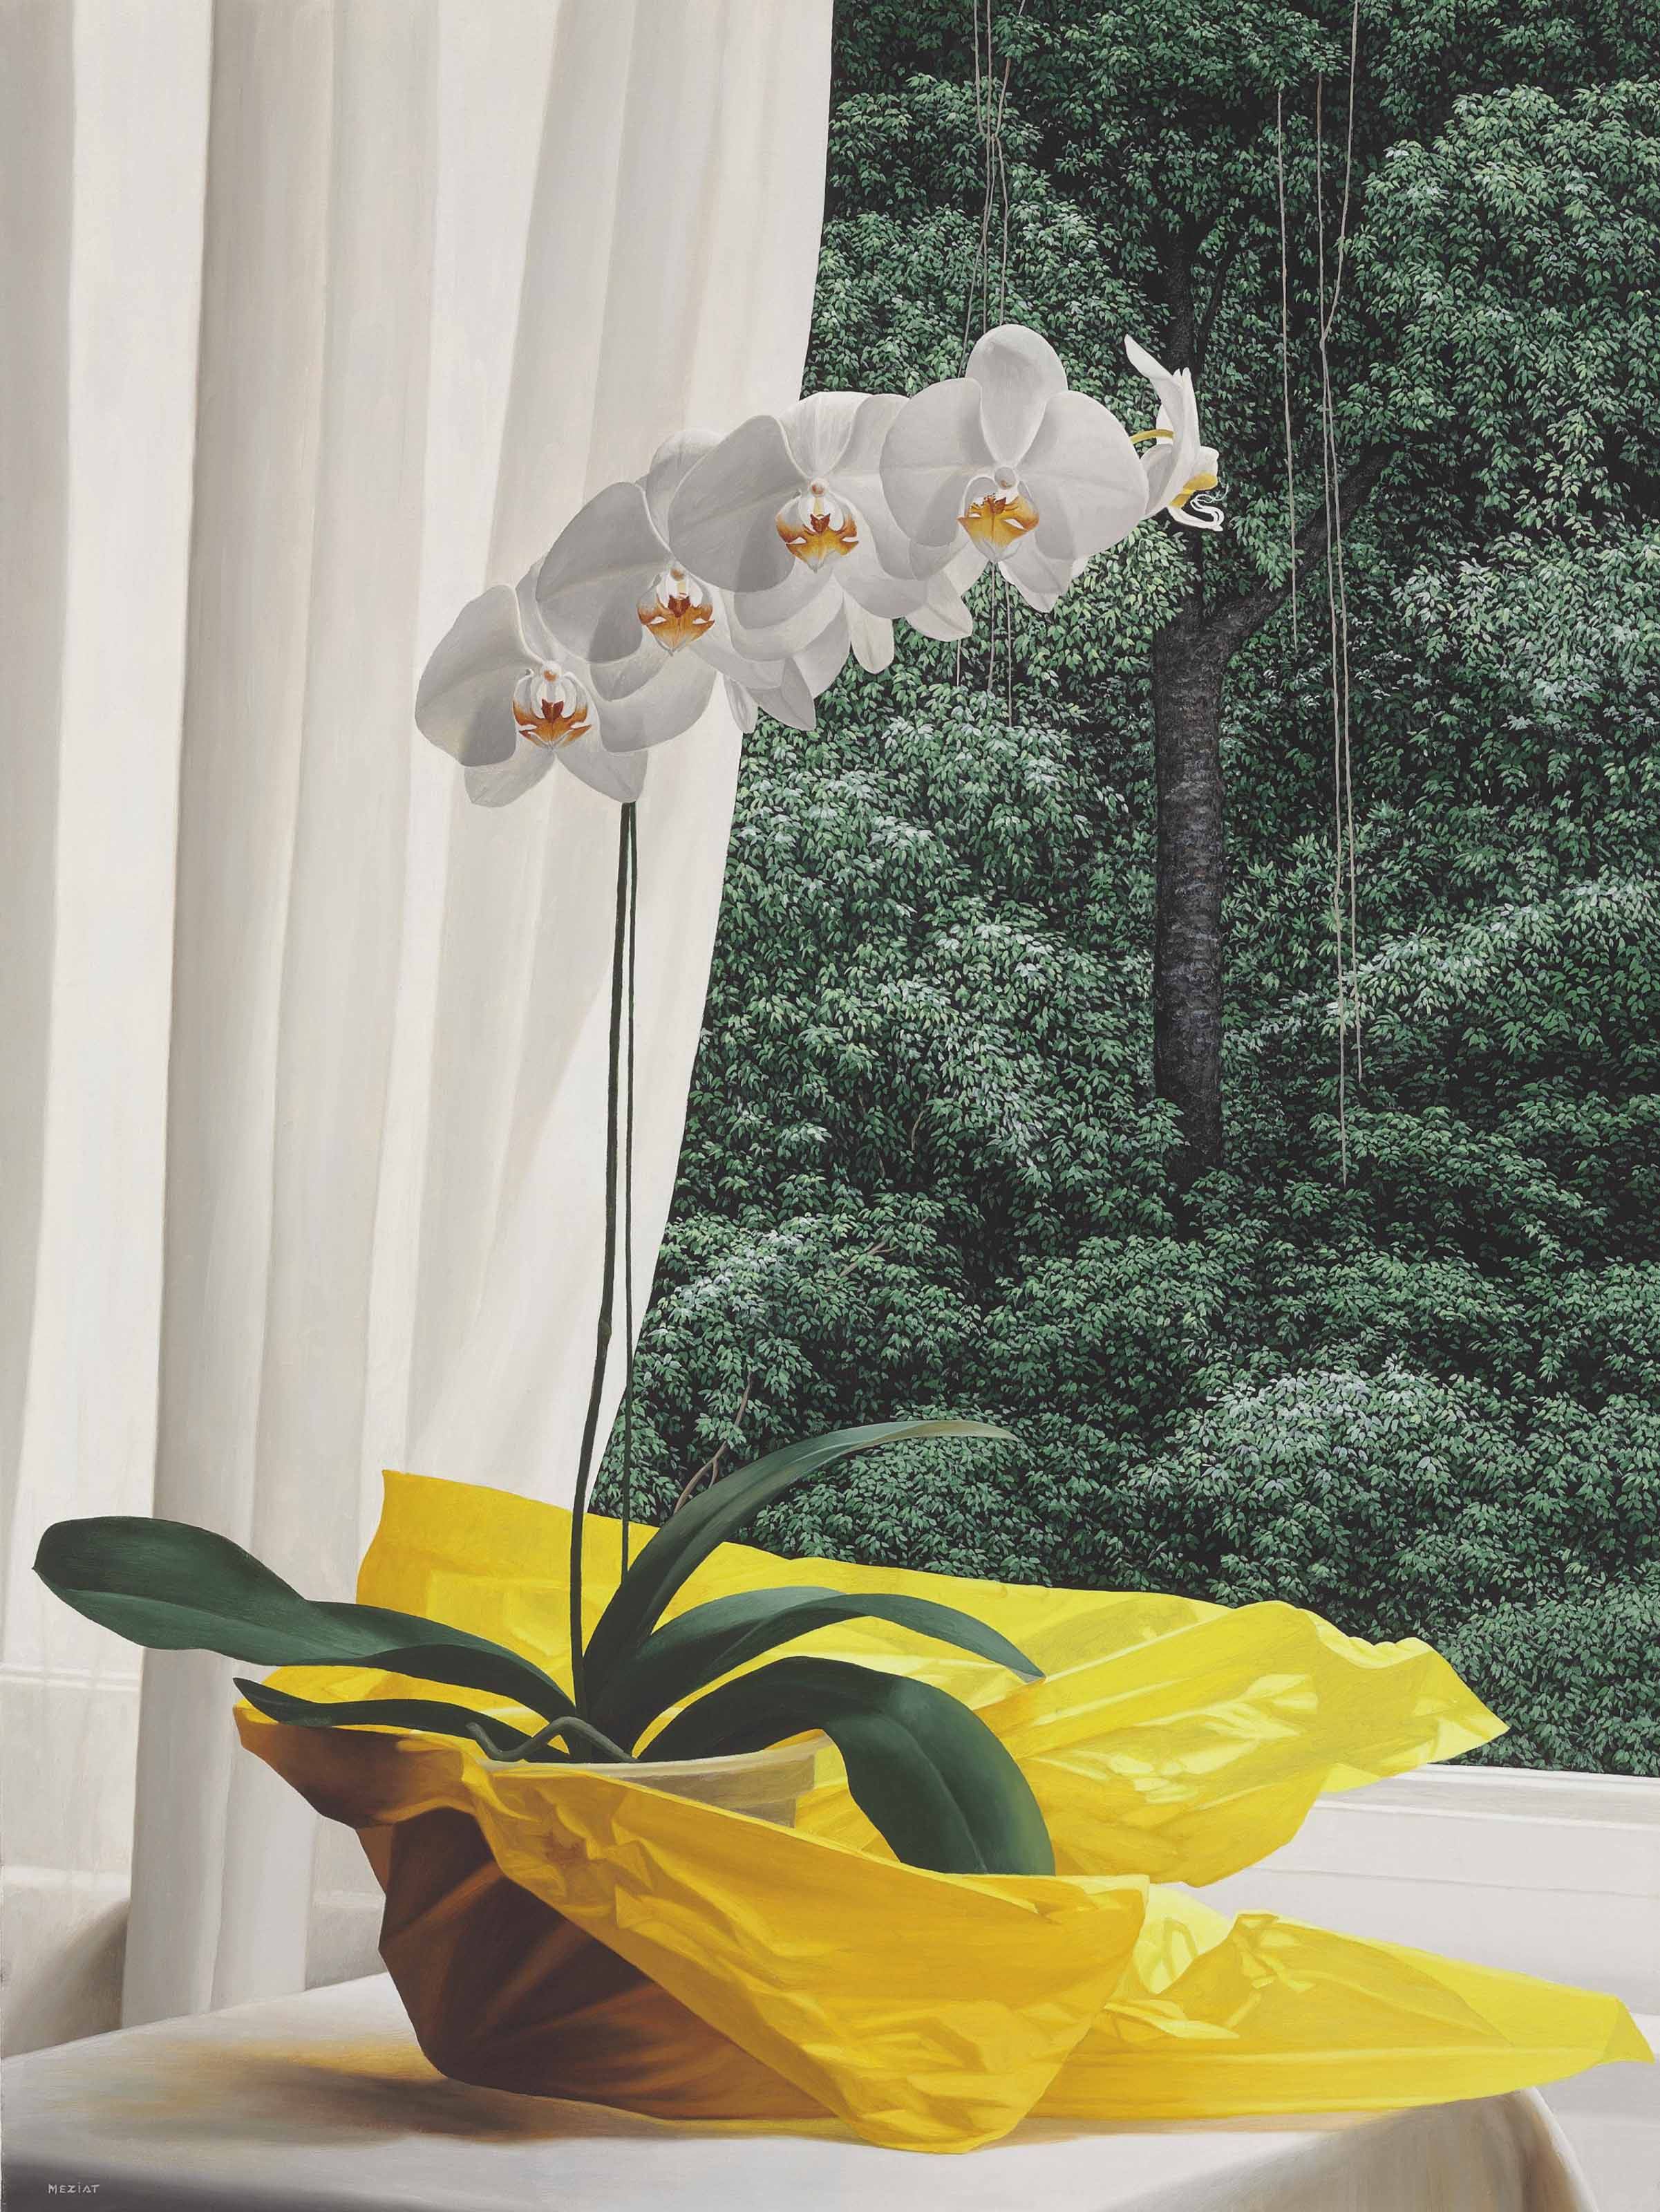 Orquídea com amarelo